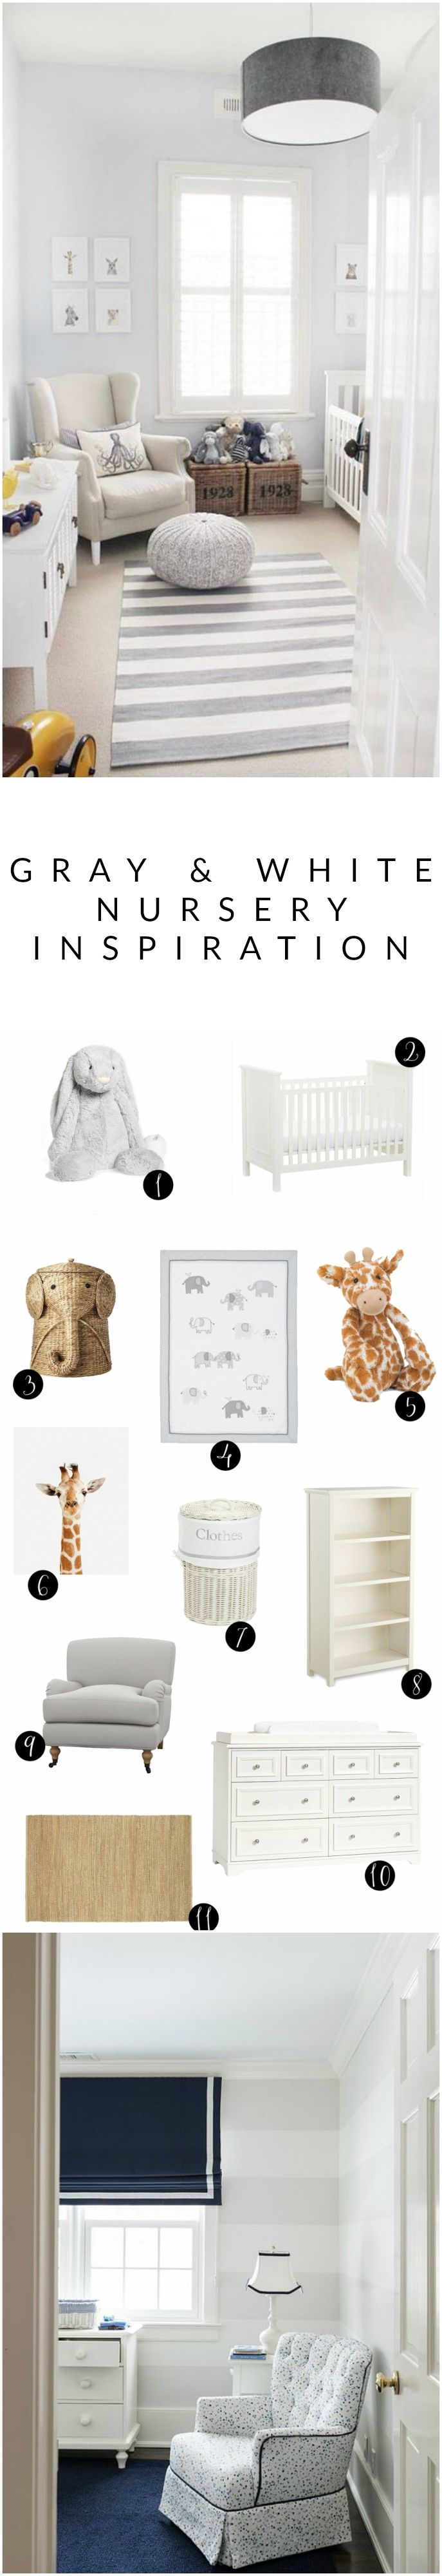 Gray and white nursery inspiration.